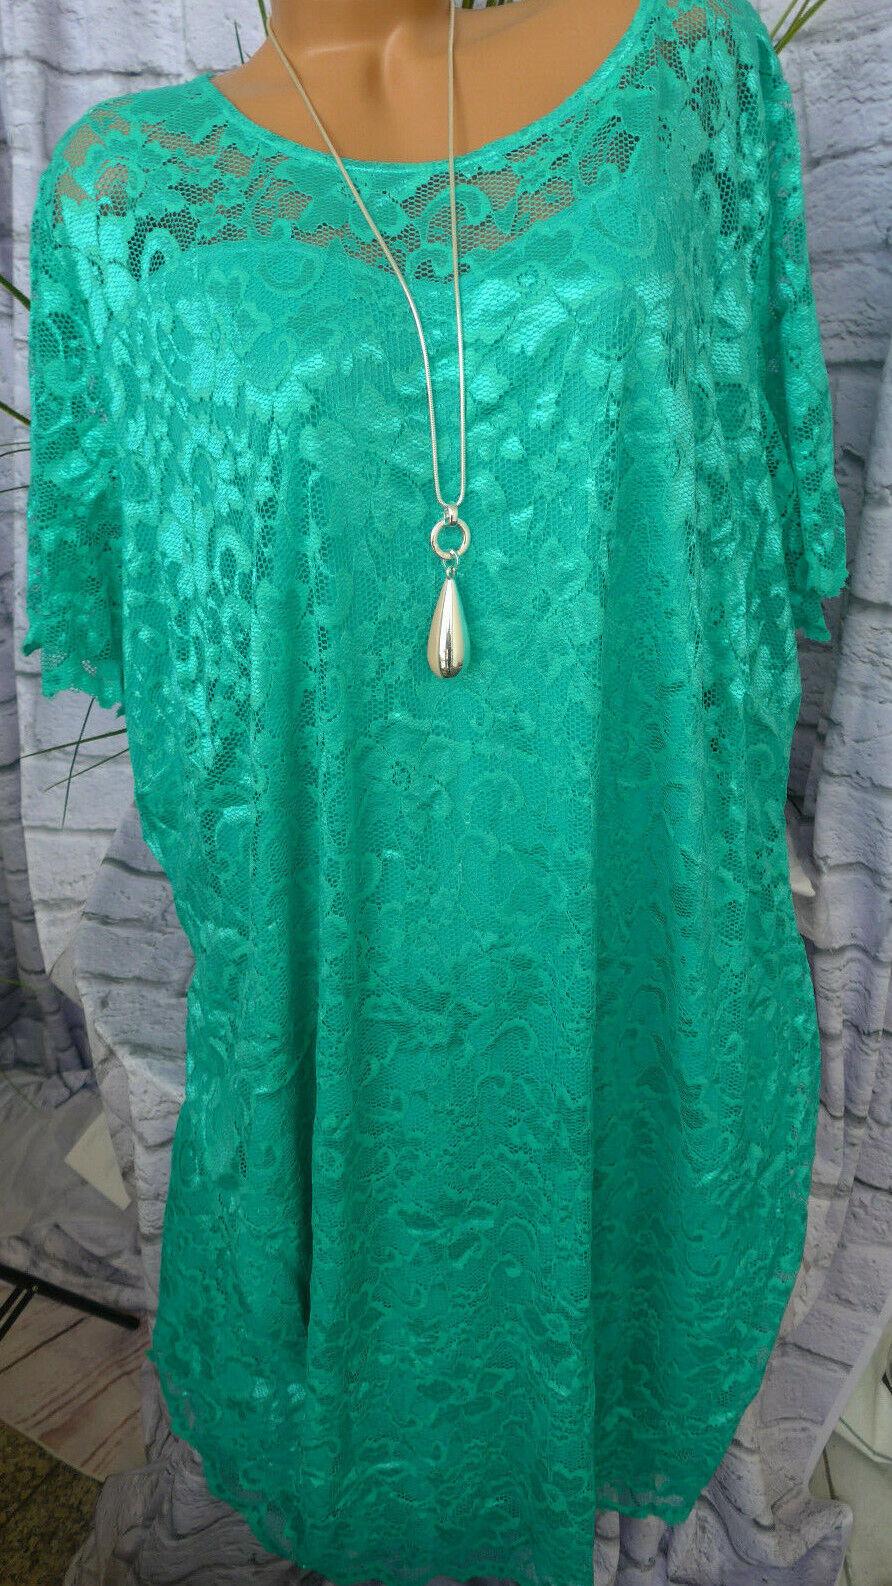 Mia Moda Kleid Spitzenkleid blau Ton Gr. 62 Übergröße (336)